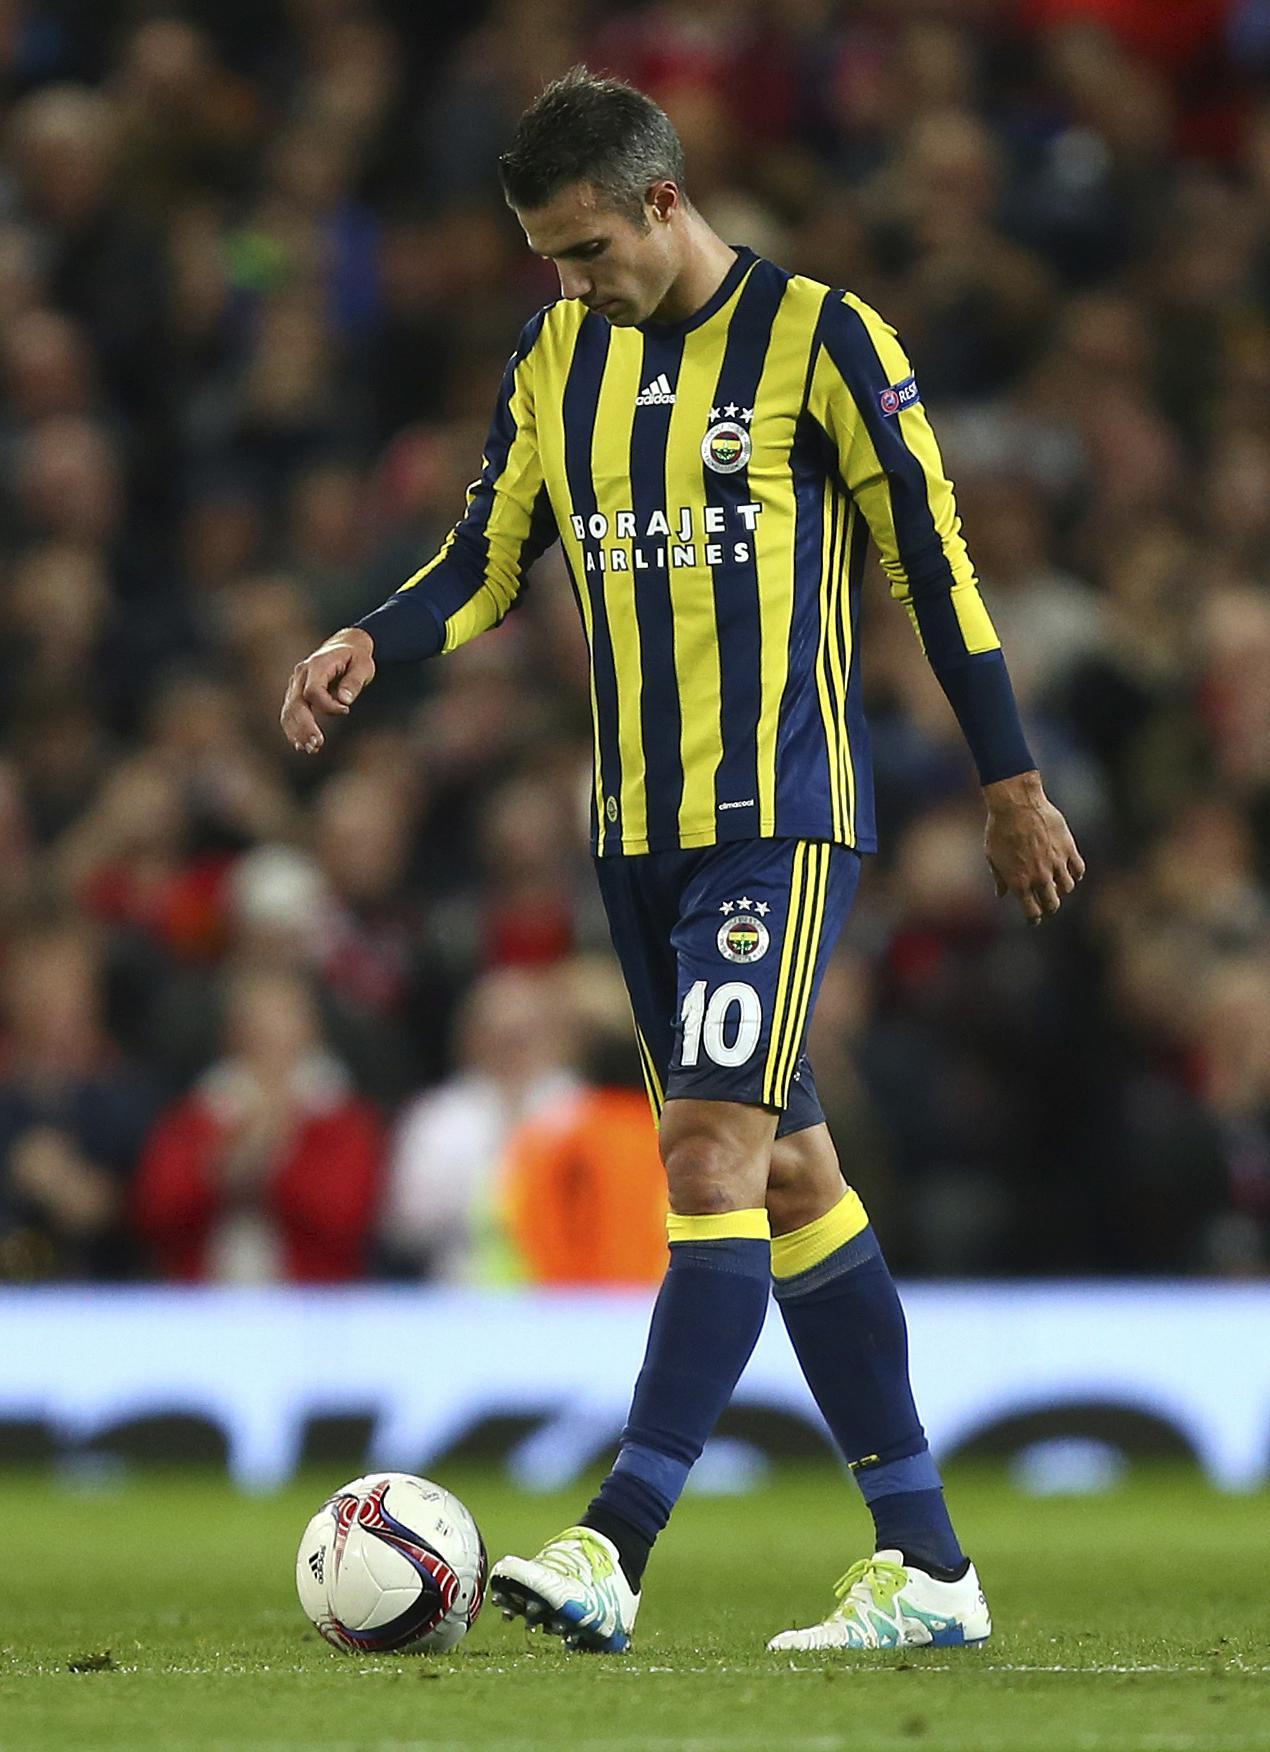 The Dutchman has endured a less-than-impressive spell in Turkey